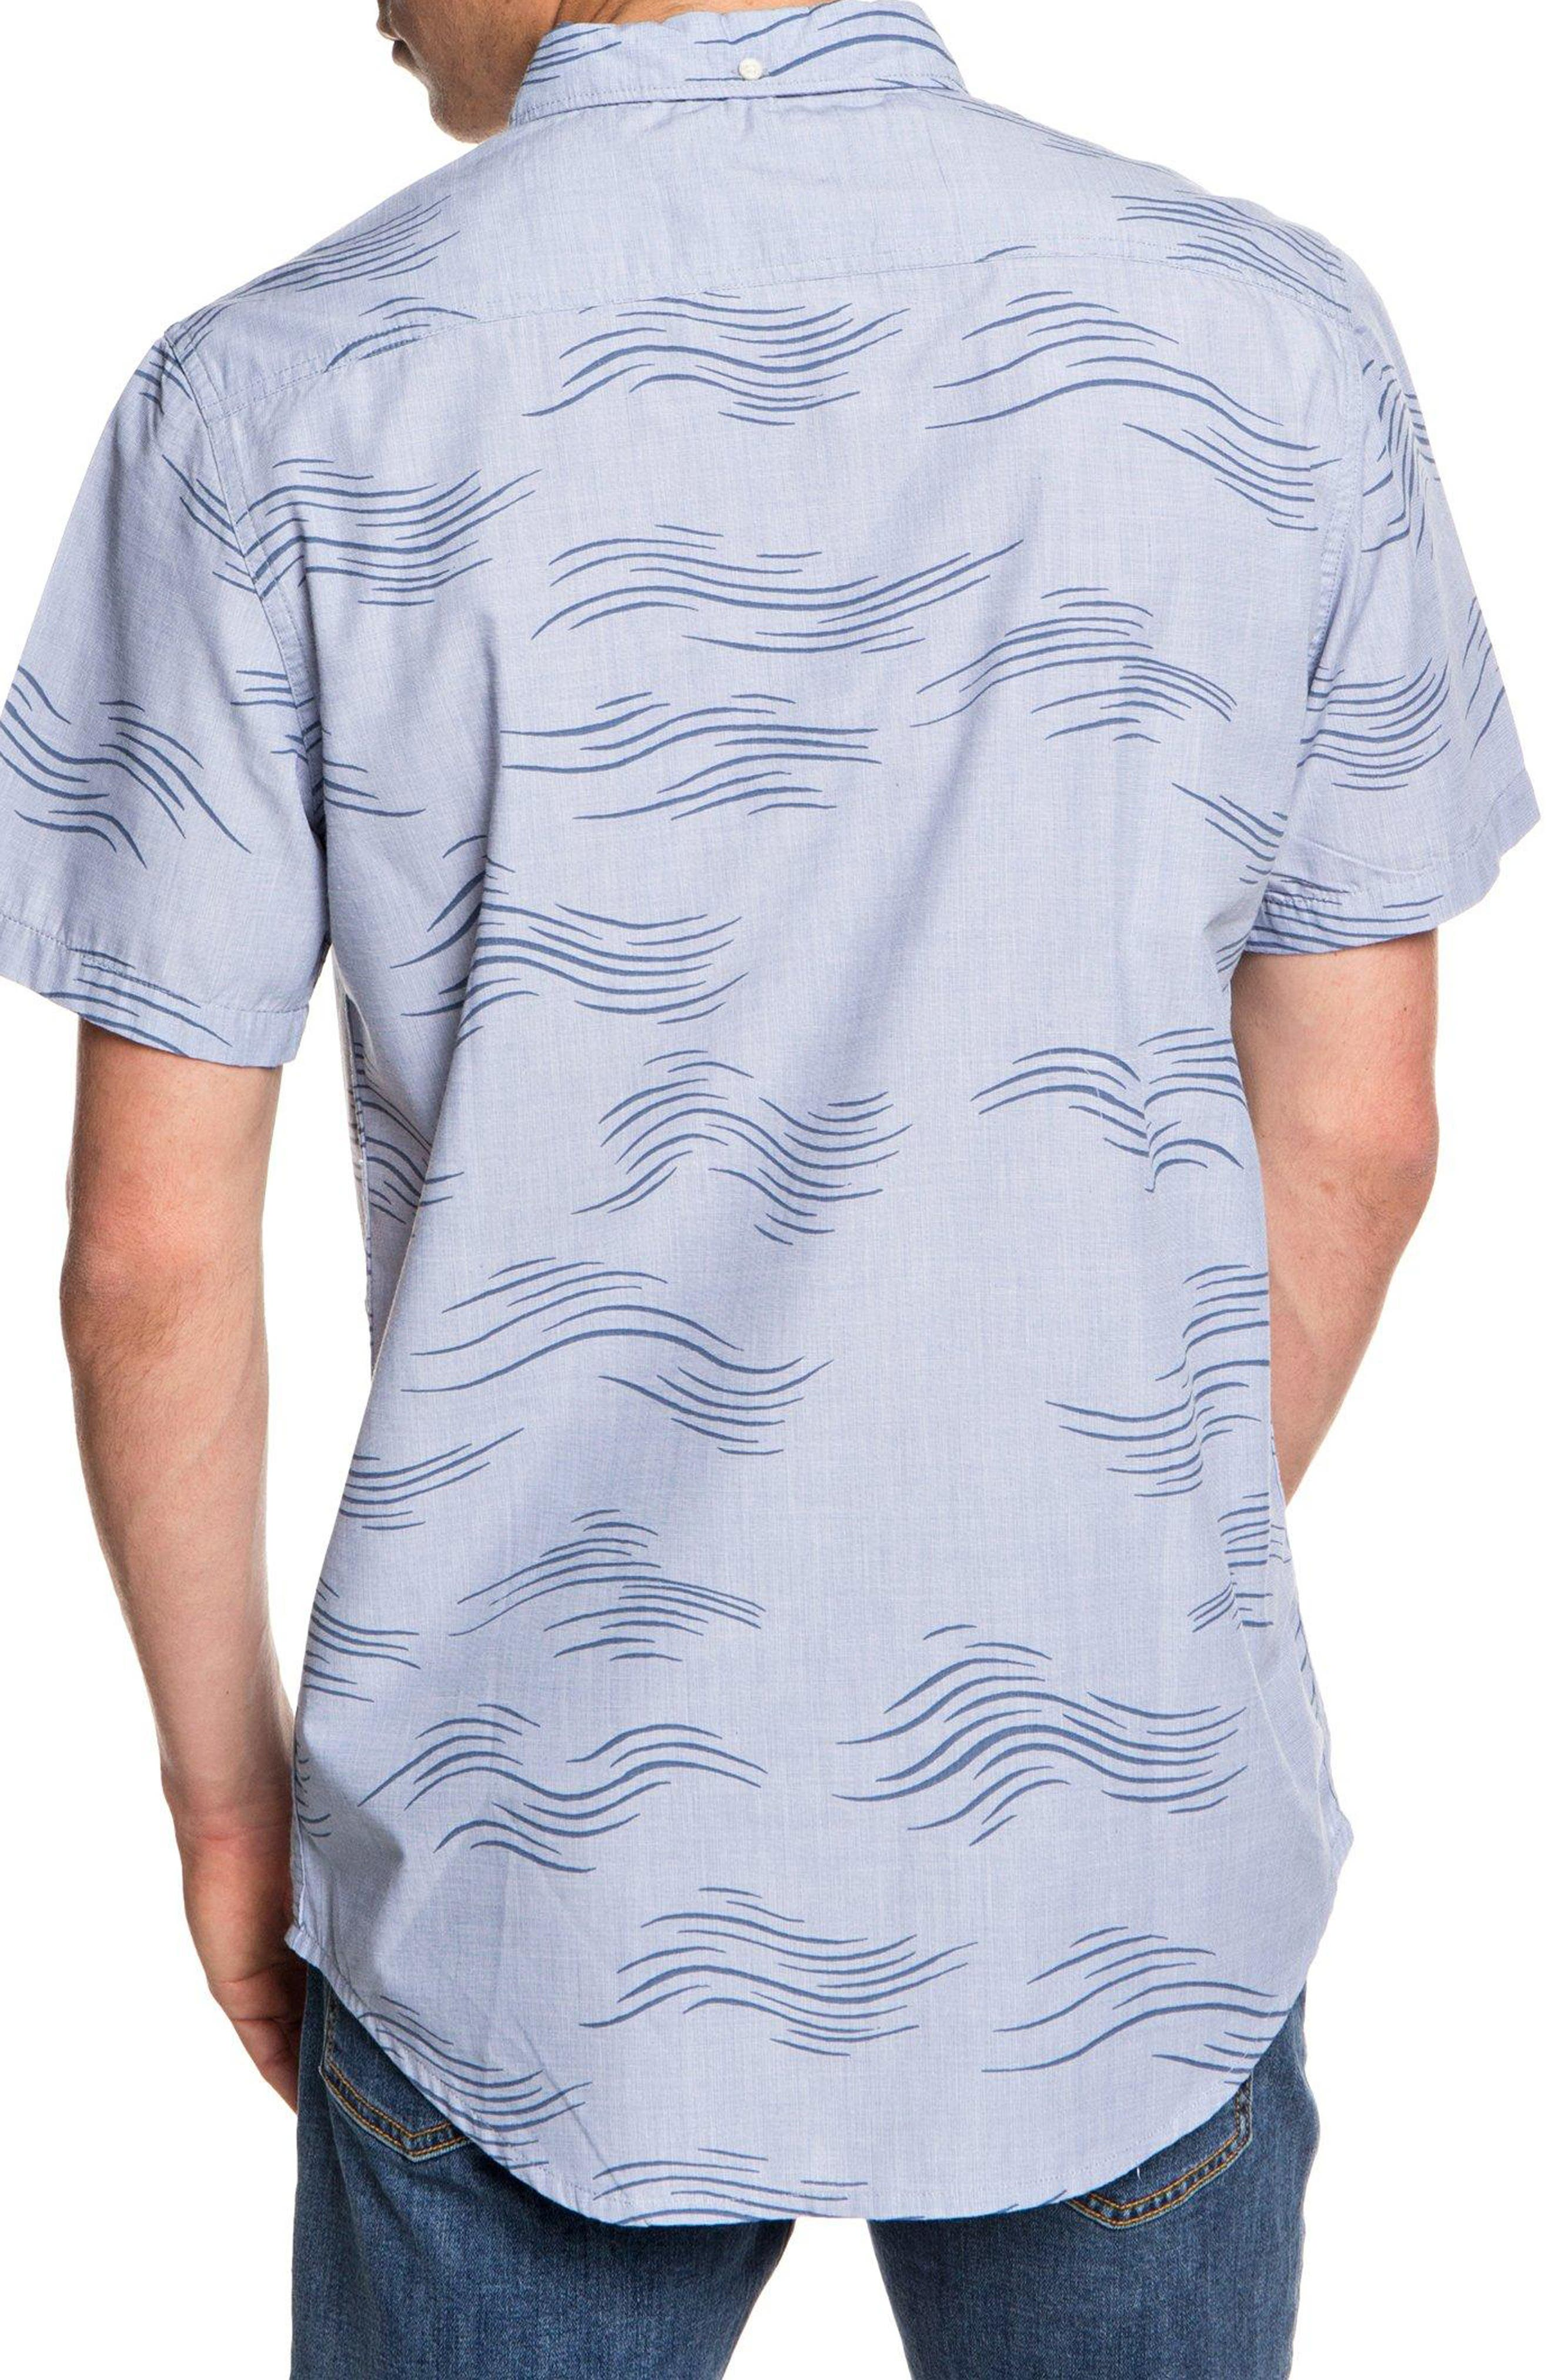 Valley Groove Print Woven Shirt,                             Alternate thumbnail 2, color,                             BIJOU BLUE VALLEY GROVE